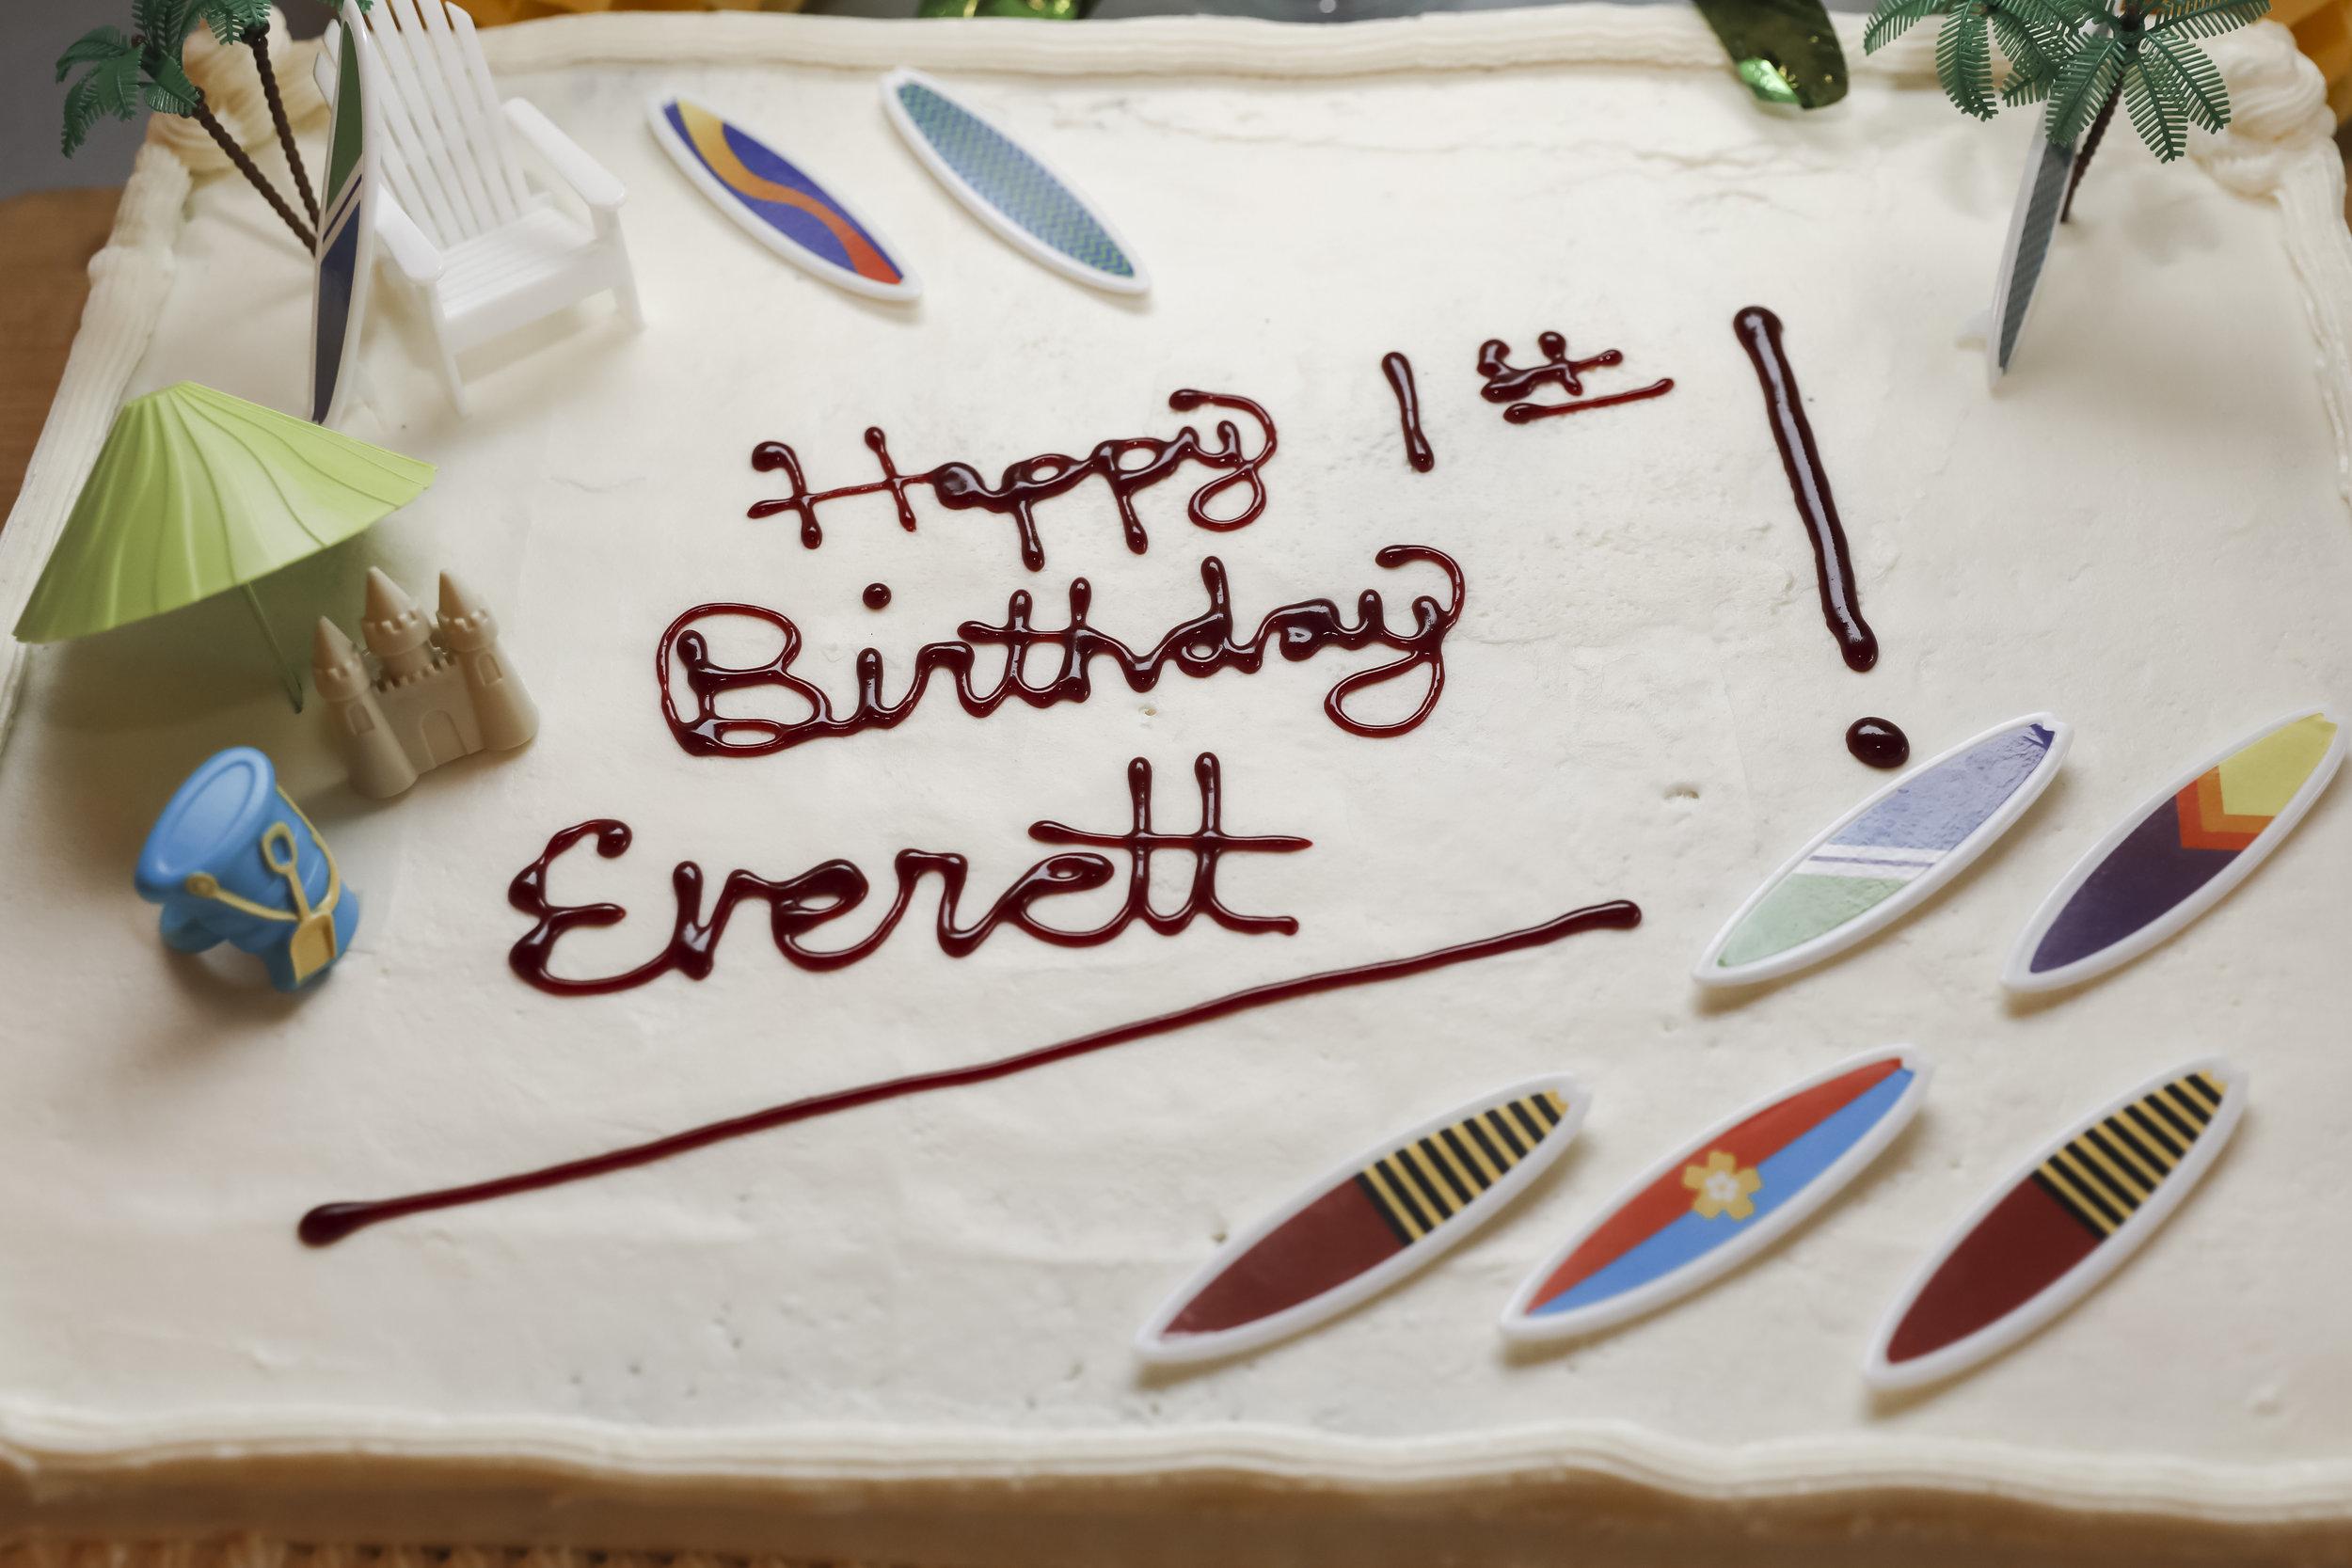 everett1stbirthday-ahp-00010.jpg